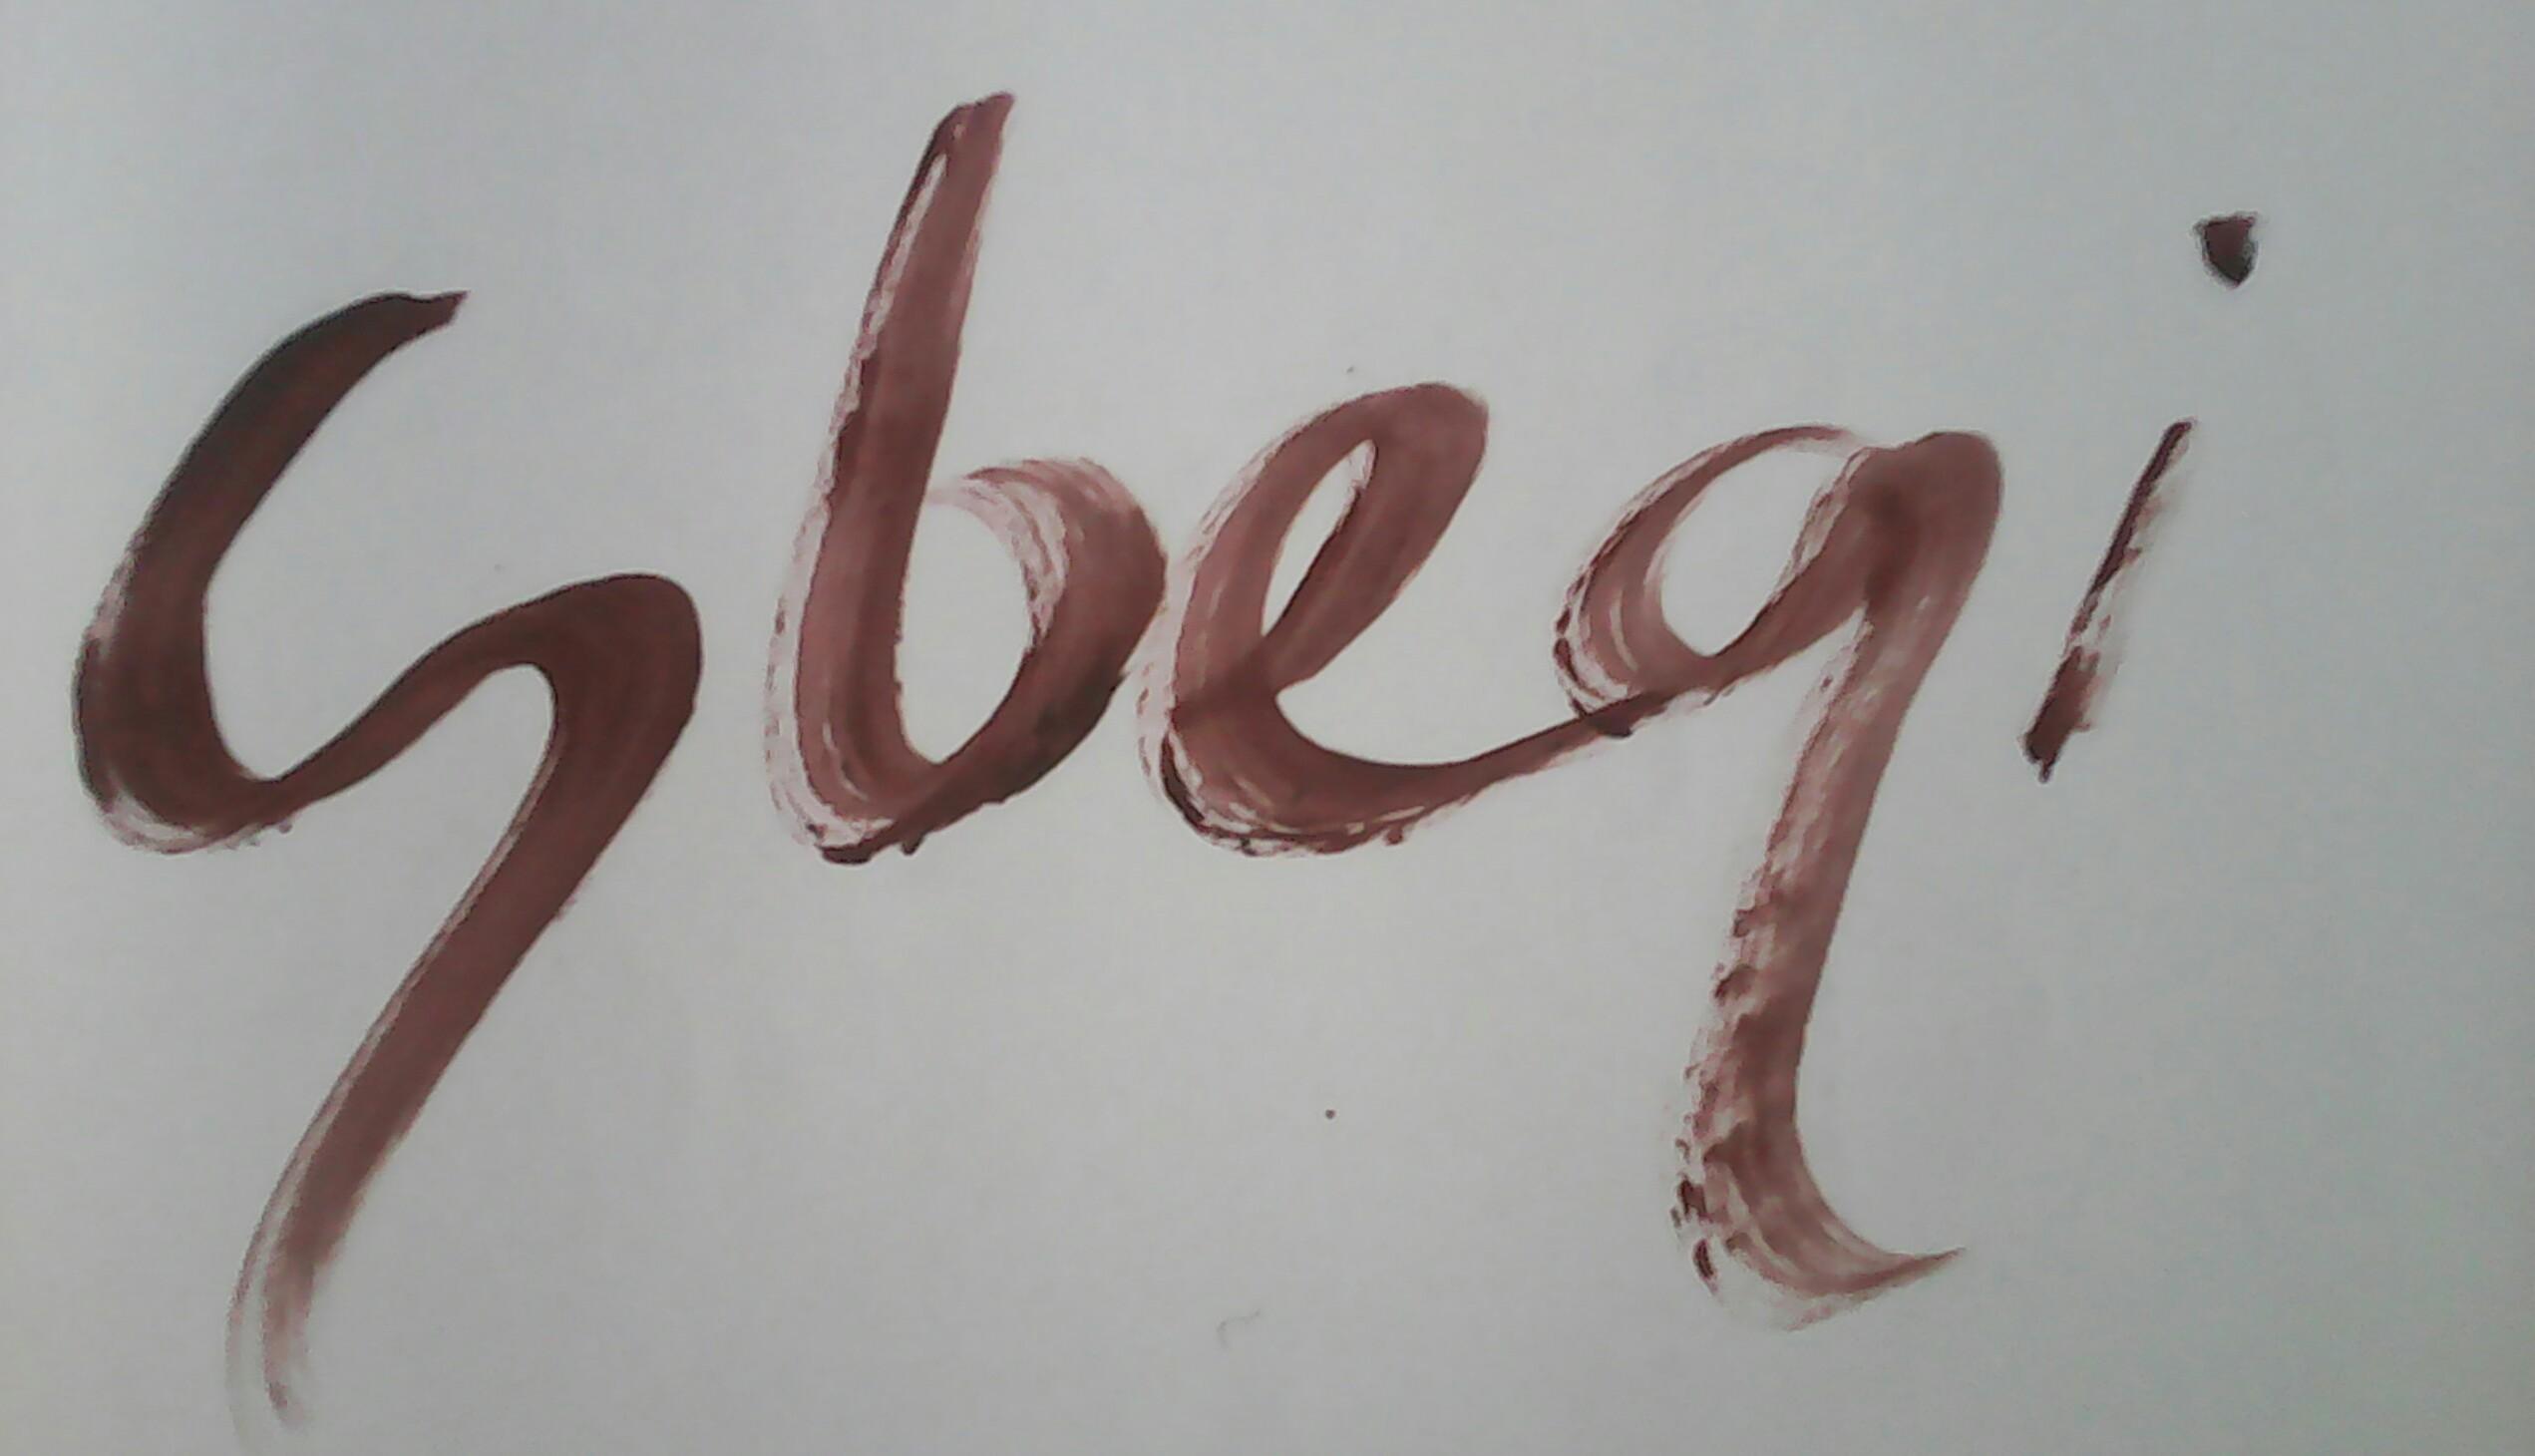 Olugbenga Akande Signature